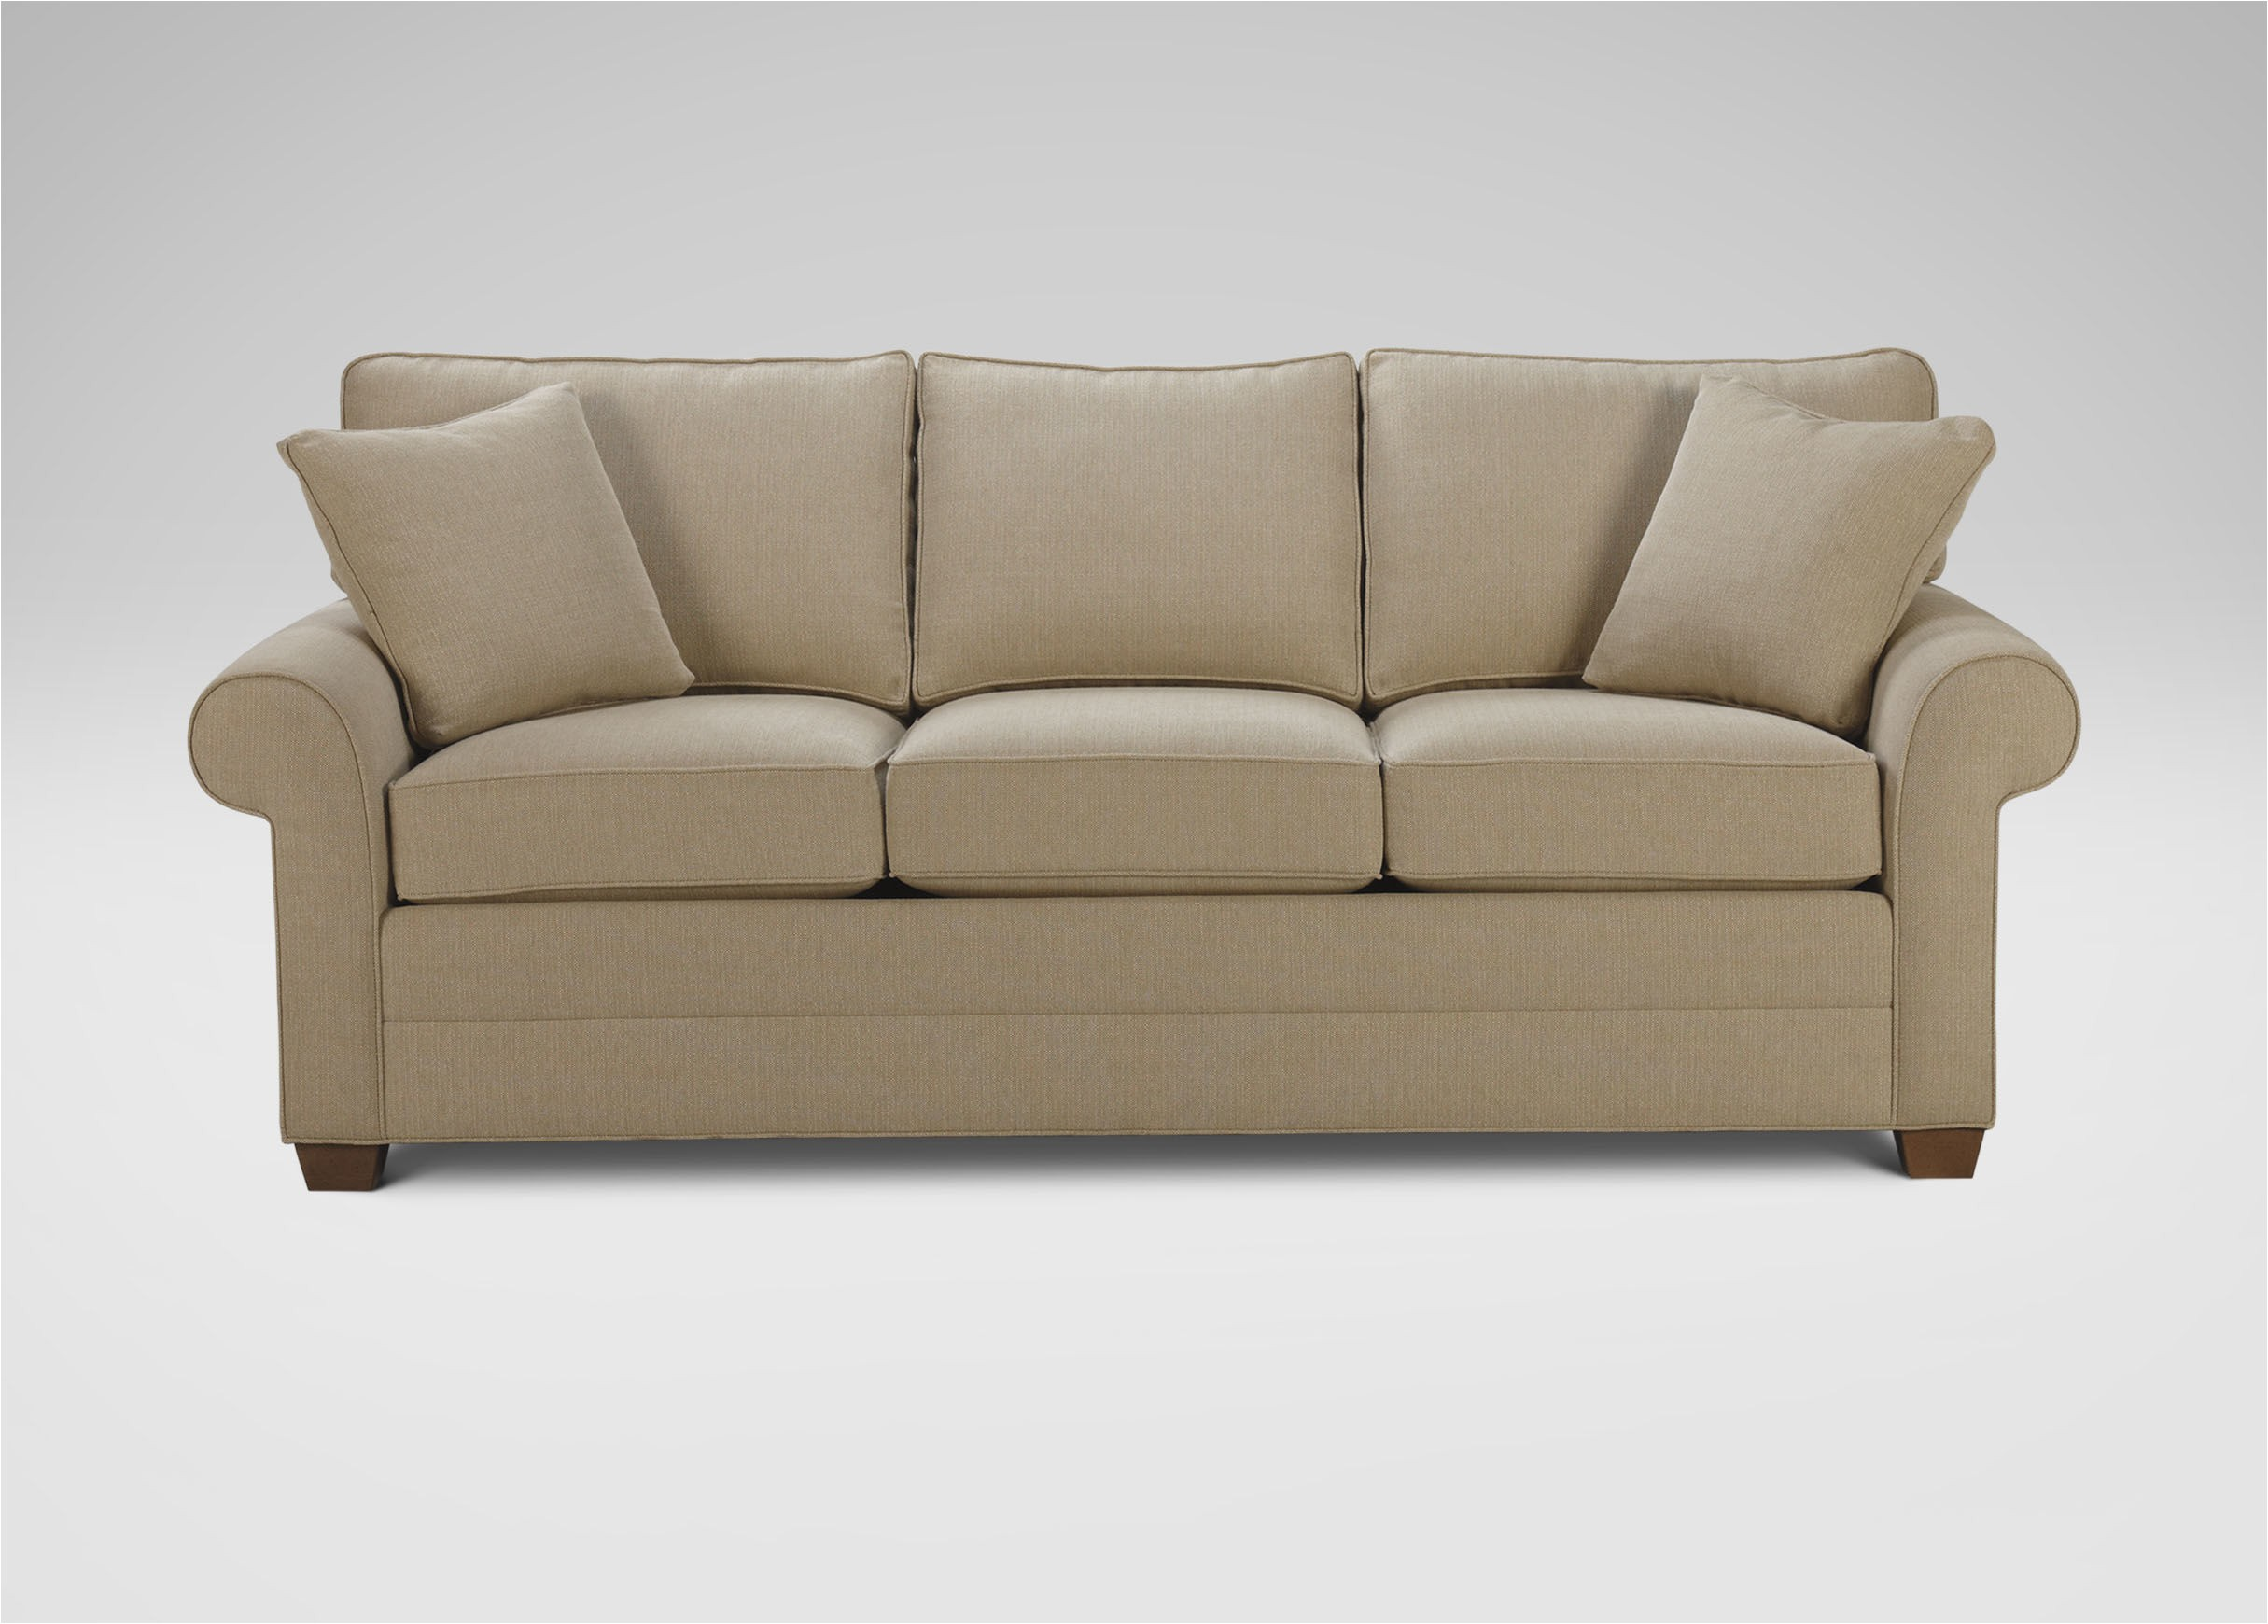 ethan allen sofa sleepers